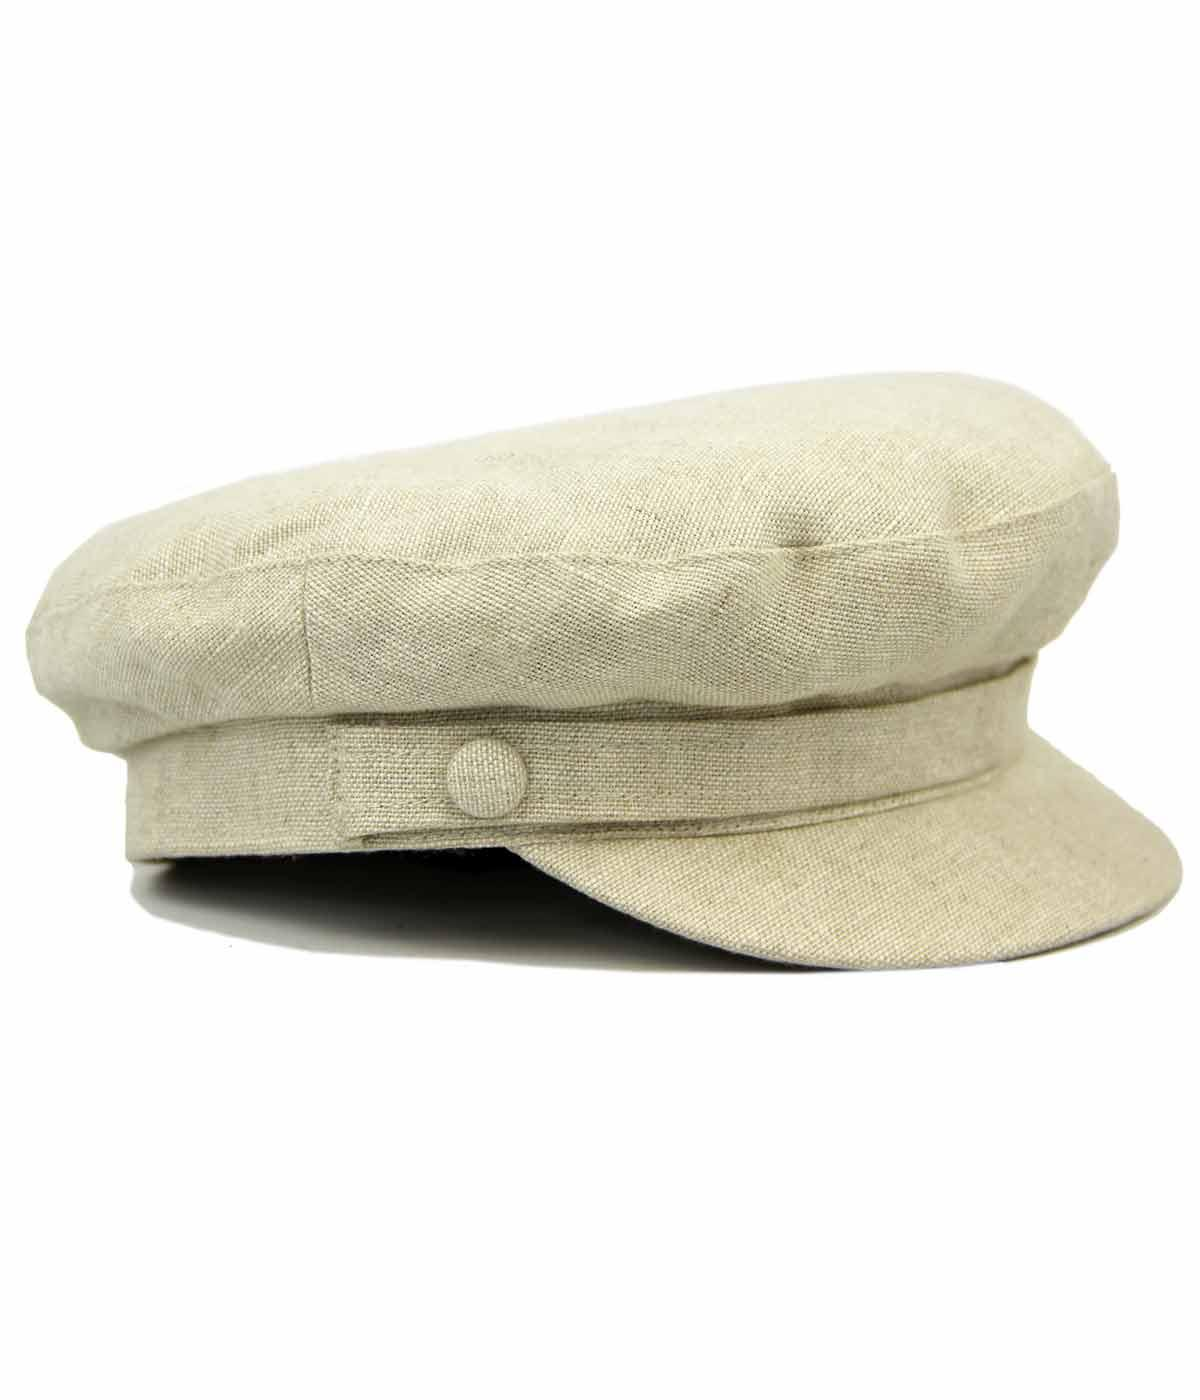 FAILSWORTH 60s Mod Irish Linen Beatle Hat NATURAL